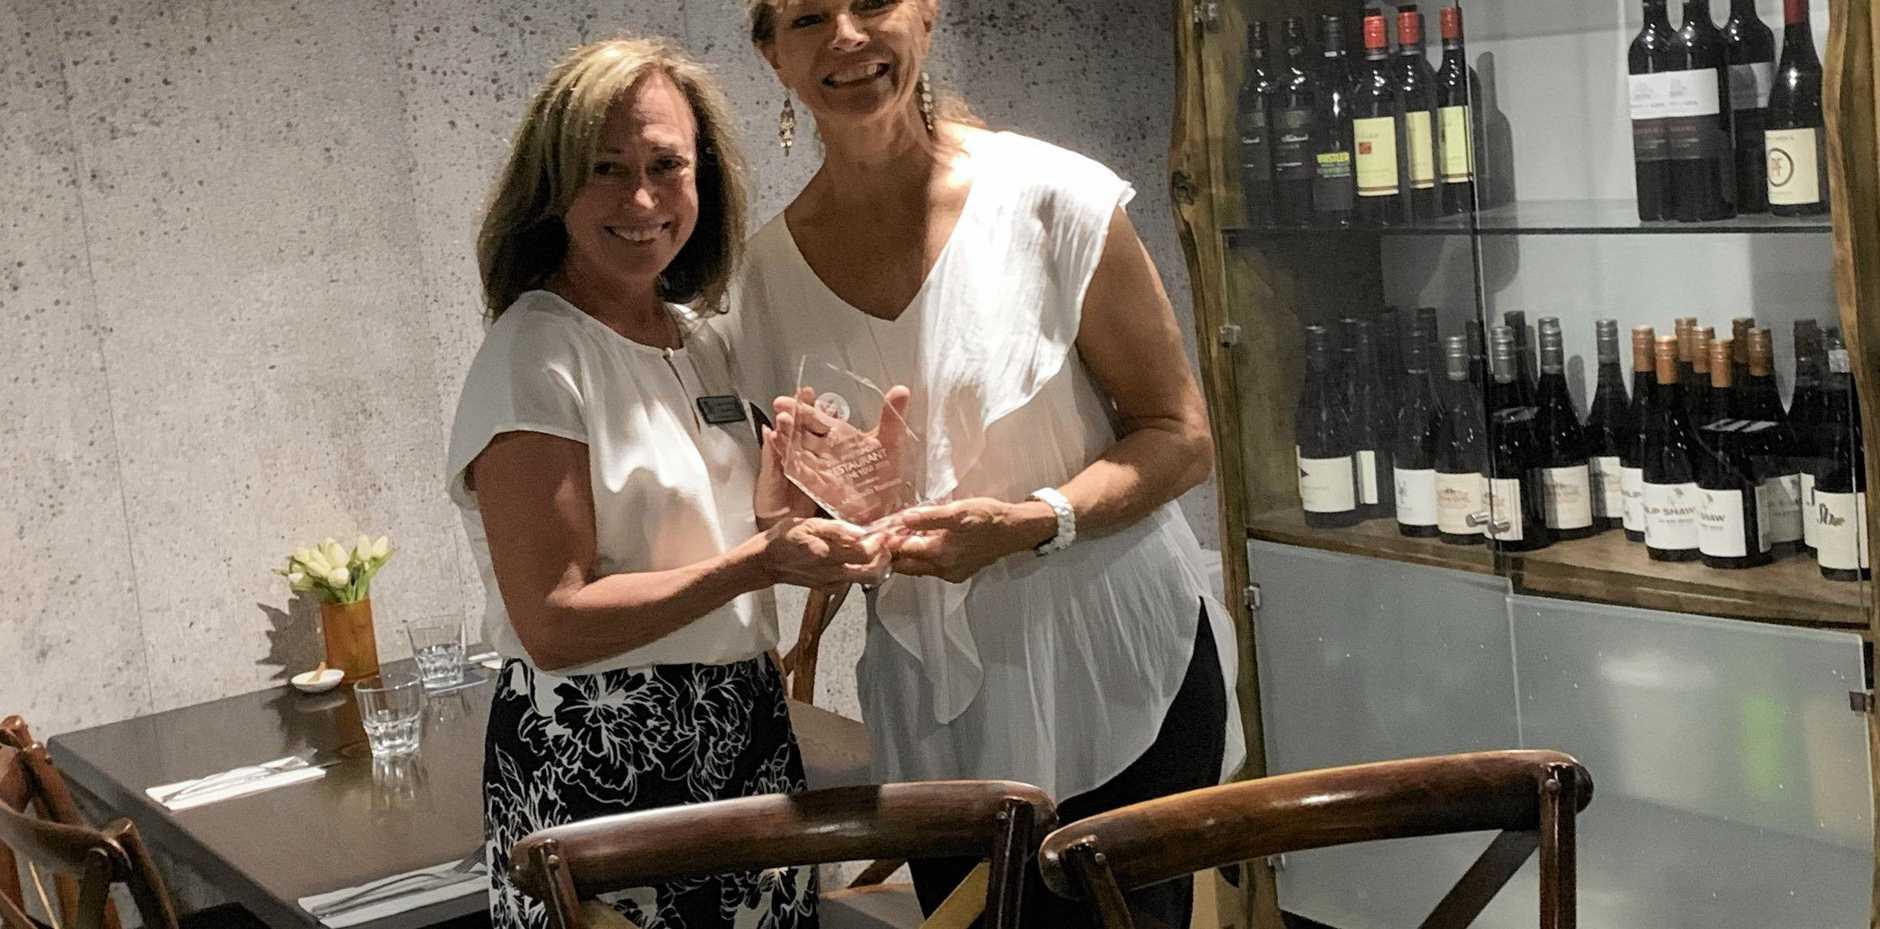 HONOURED: Skal Whitsundays president Carolyn Upton (left), presents La Tabella owner Leni Fries with the Skal Whitsunday 2018 Restaurant of the Year award.